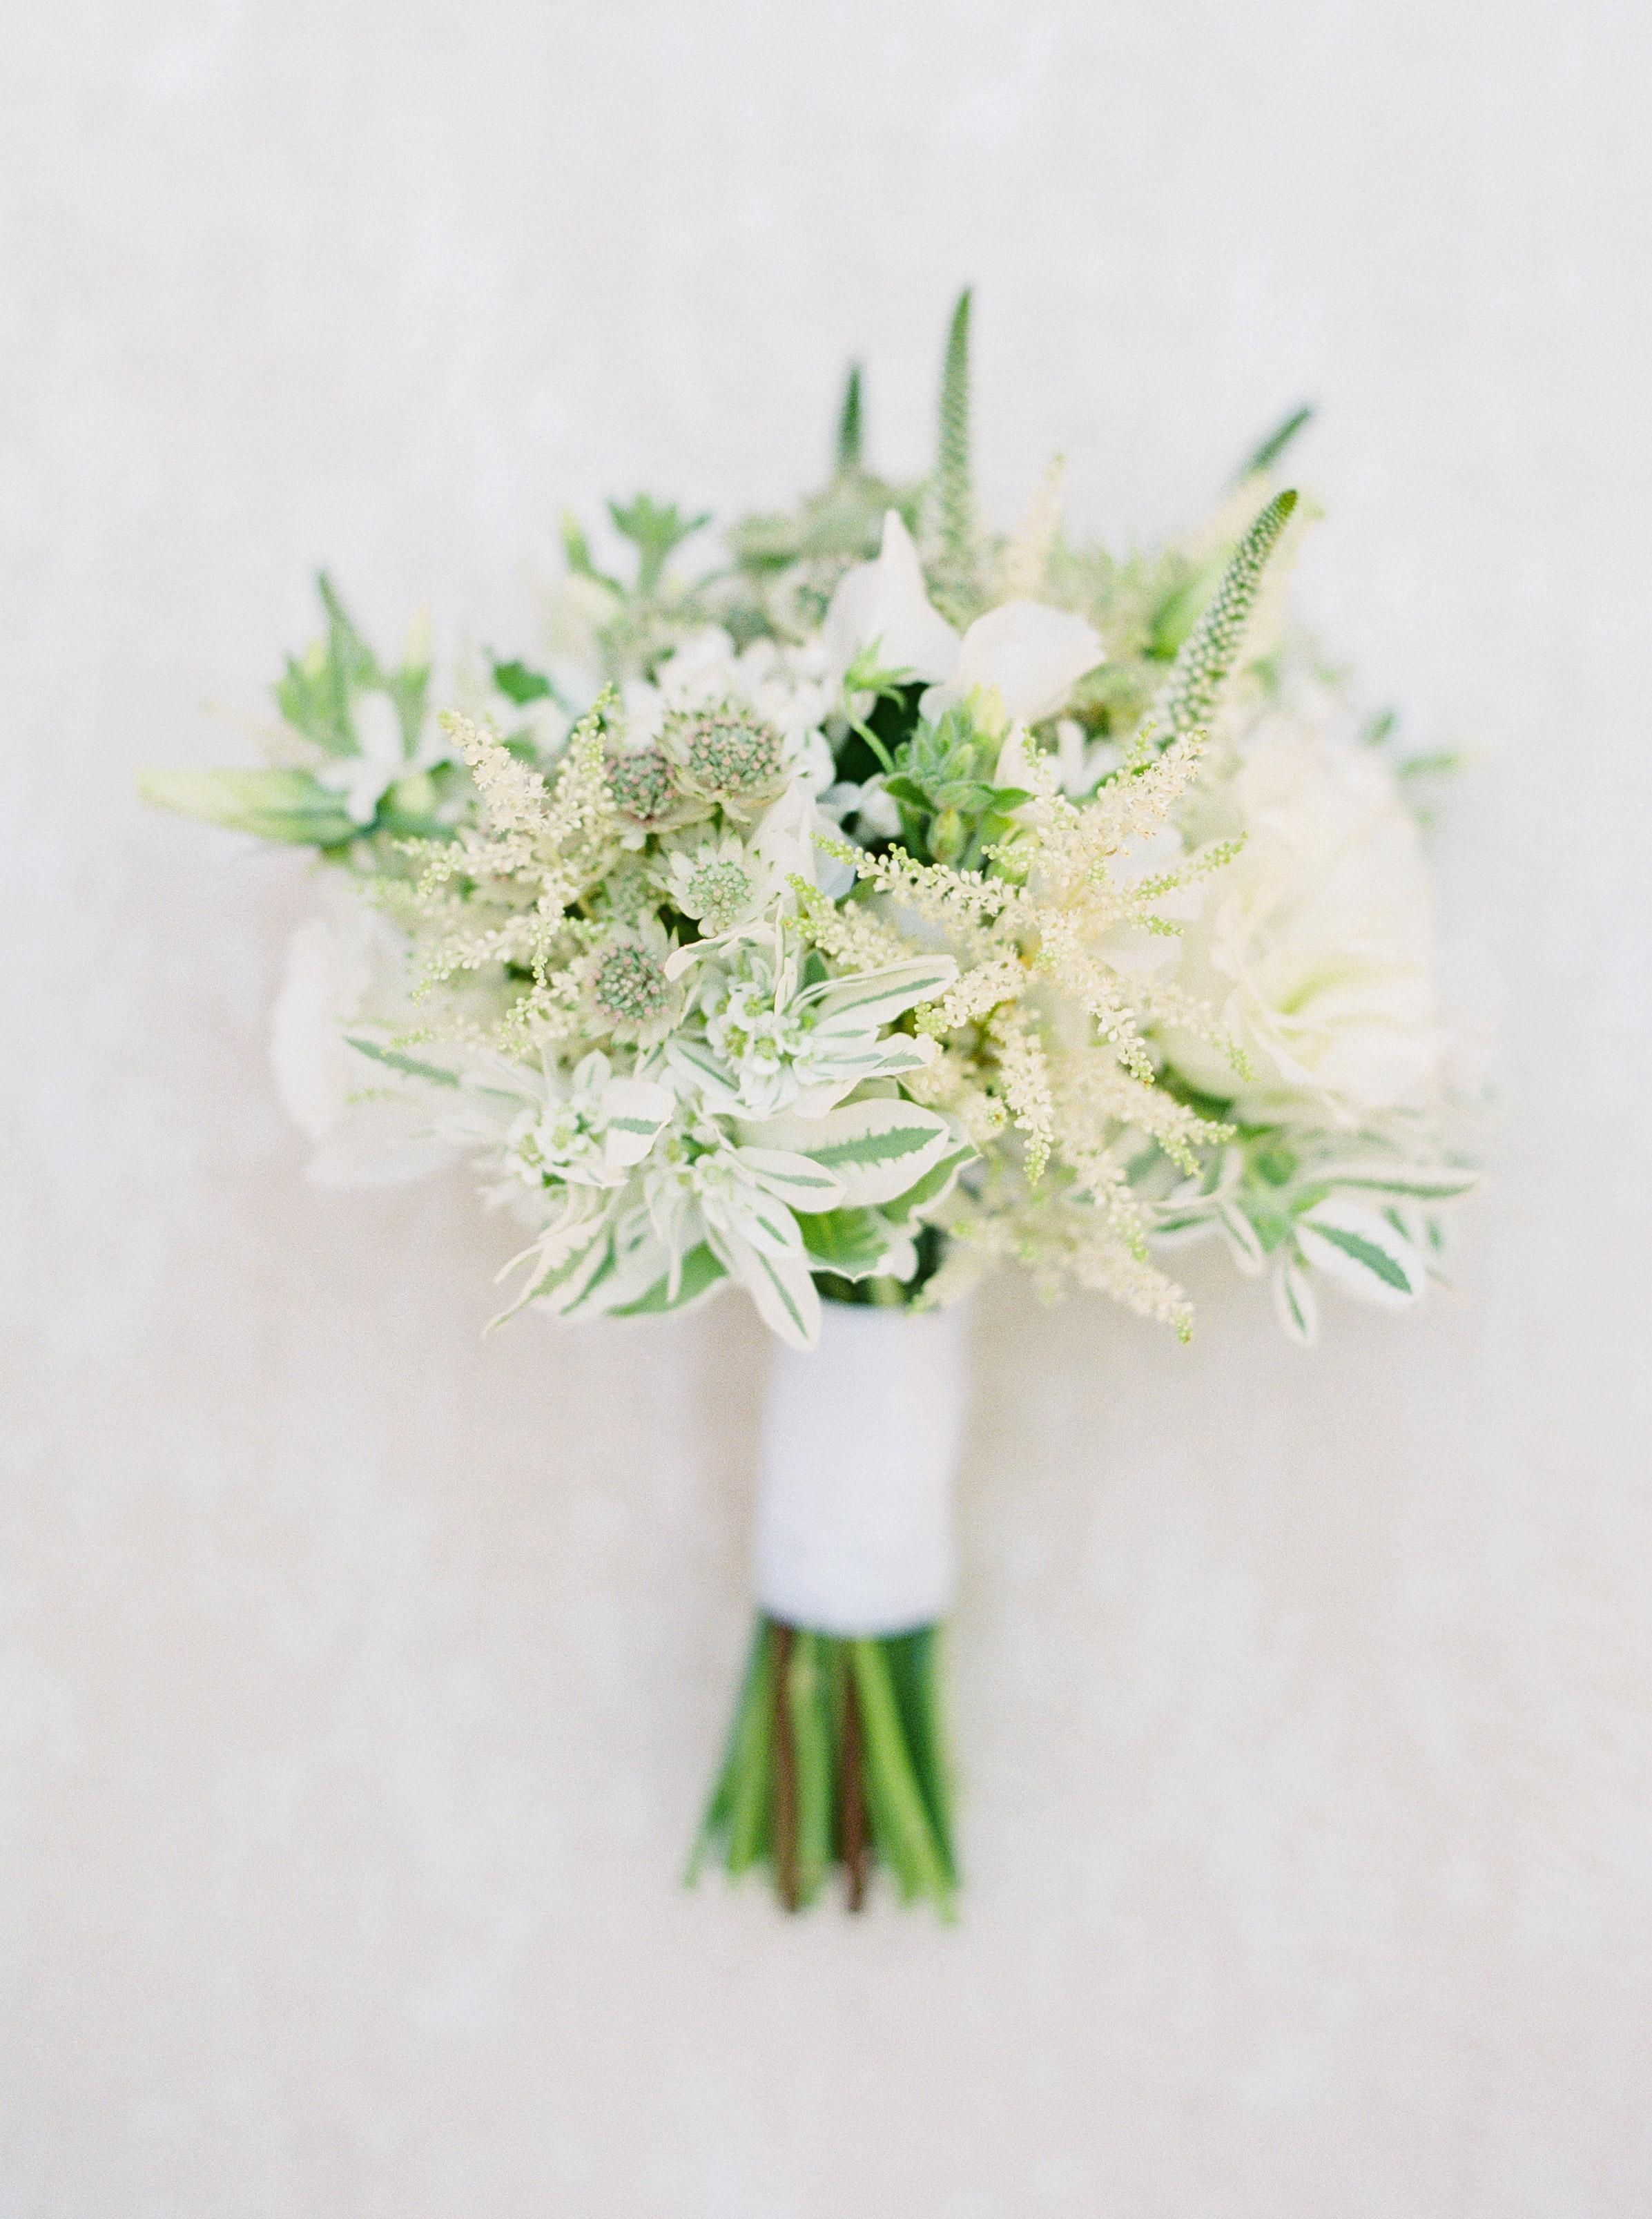 Elizabeth's wedding-bouquet